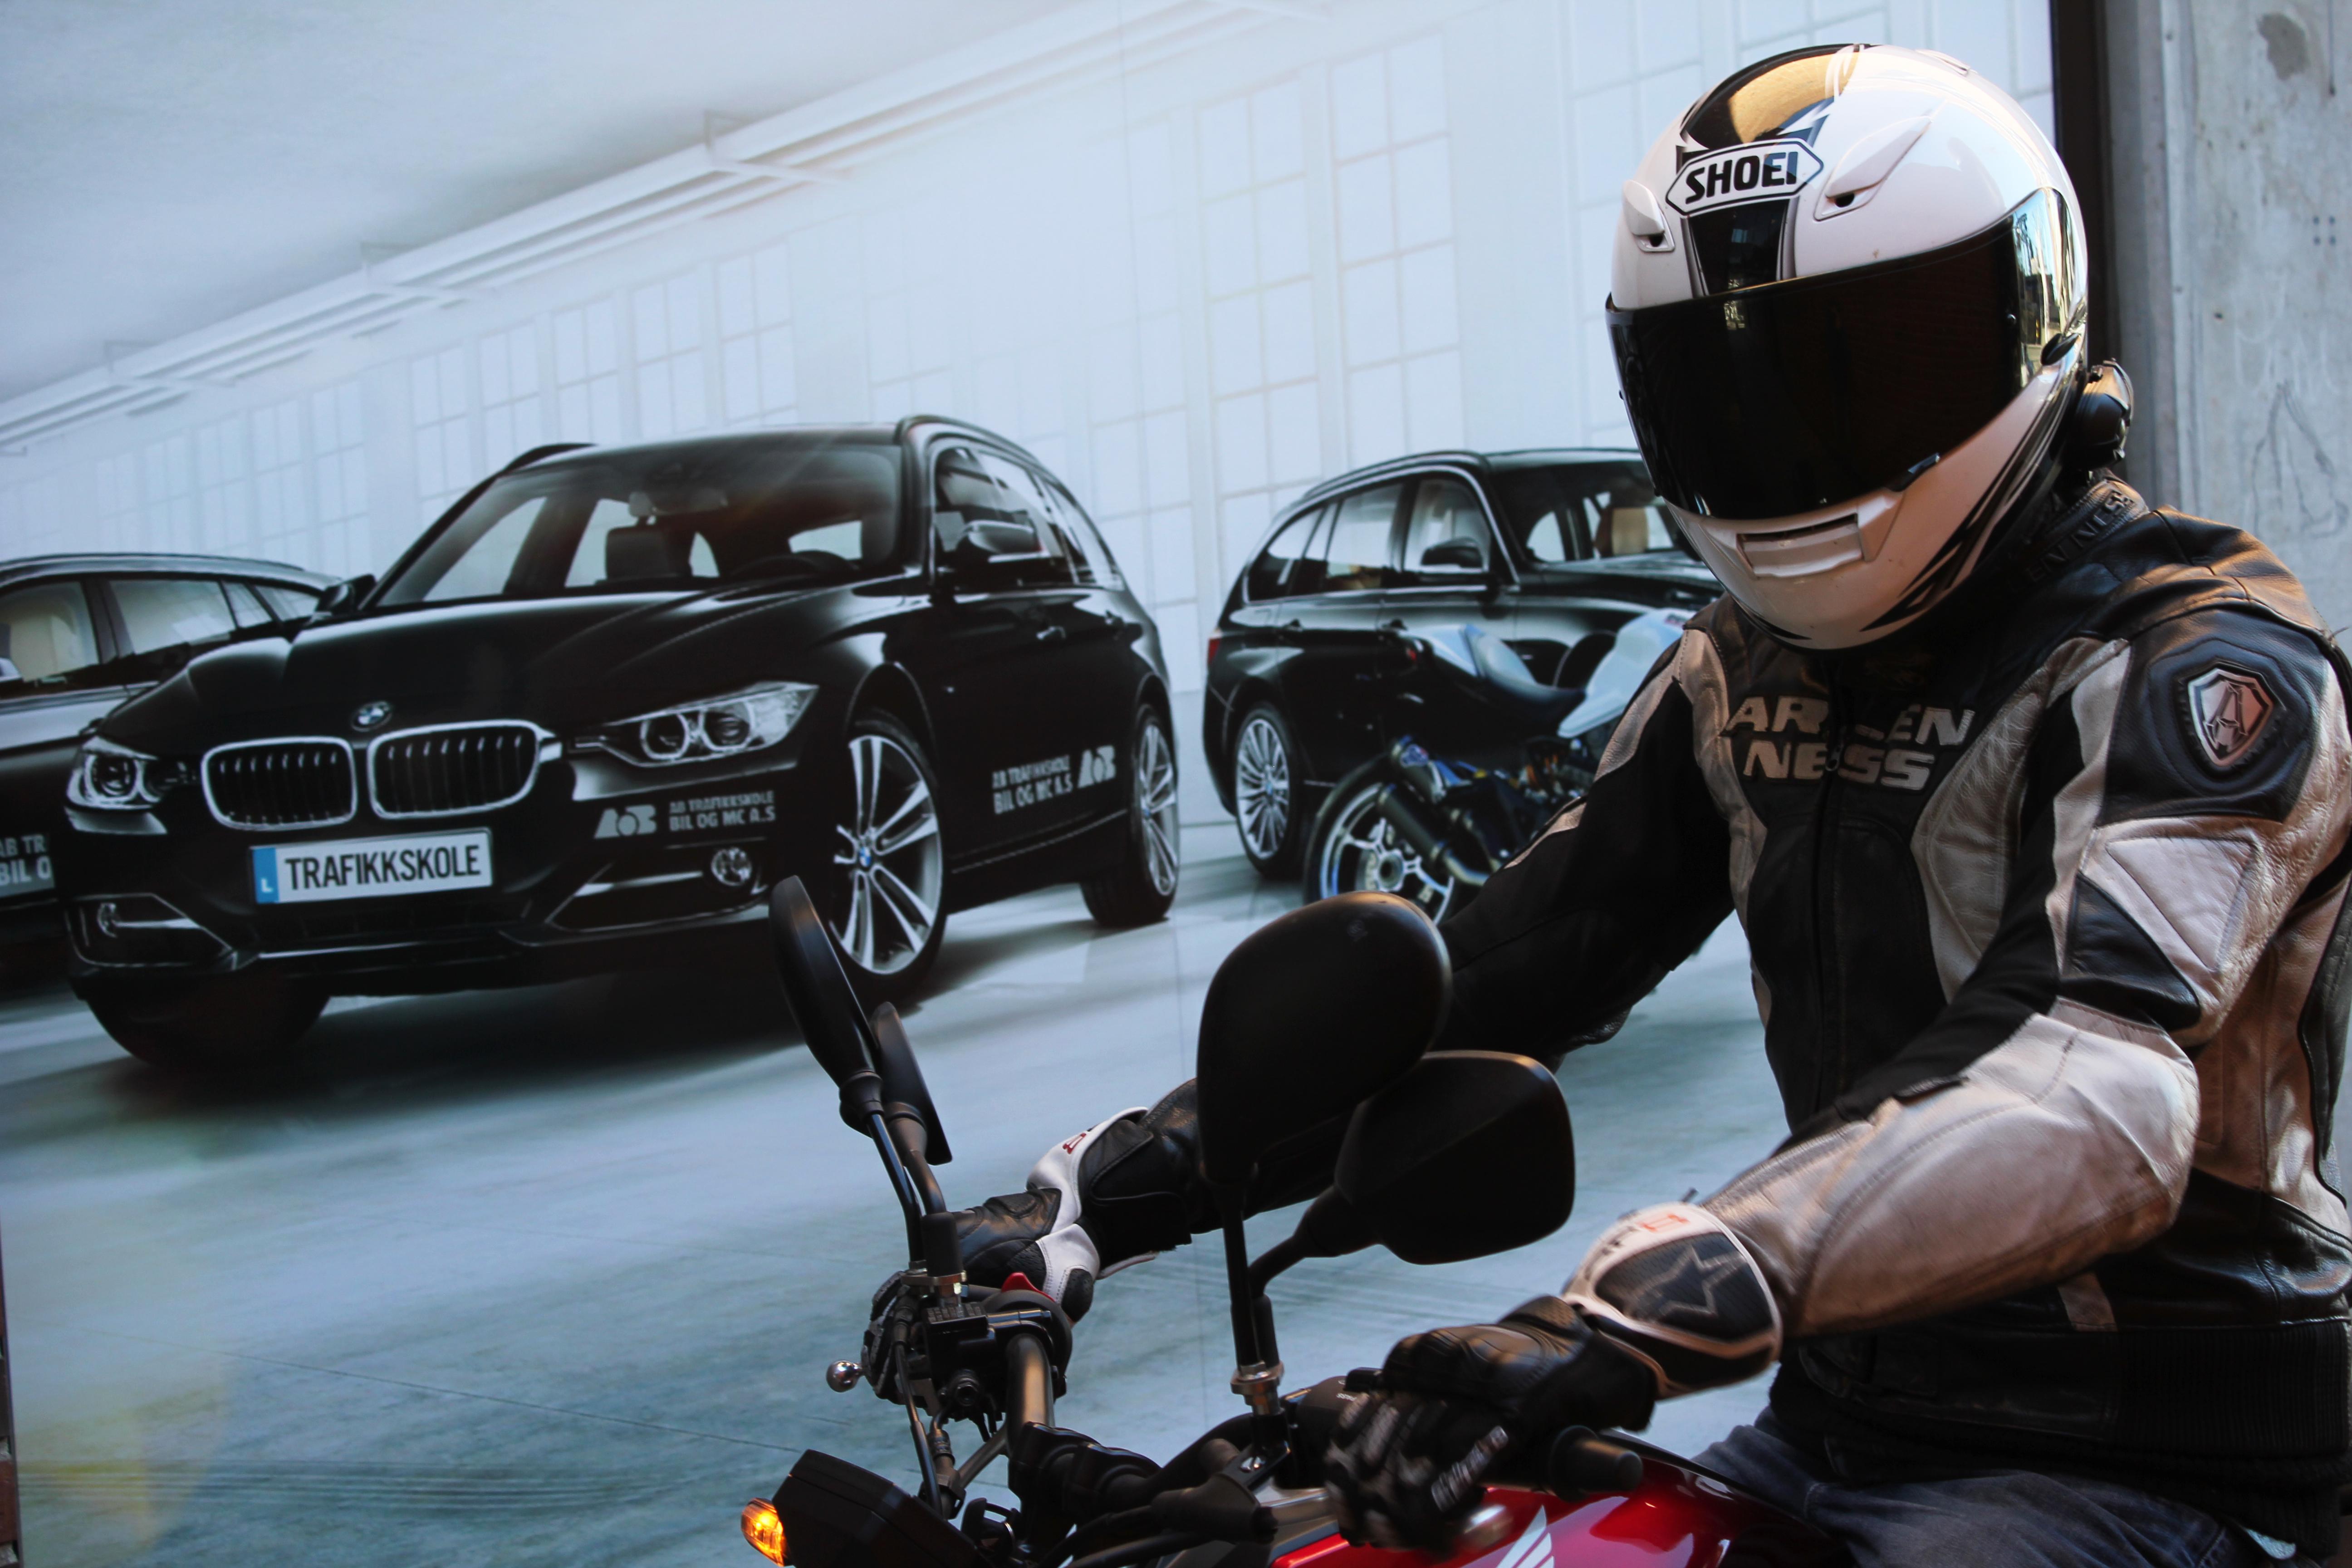 Motorsykkel førerkort! Meld deg på www.abtrafikkskole.no